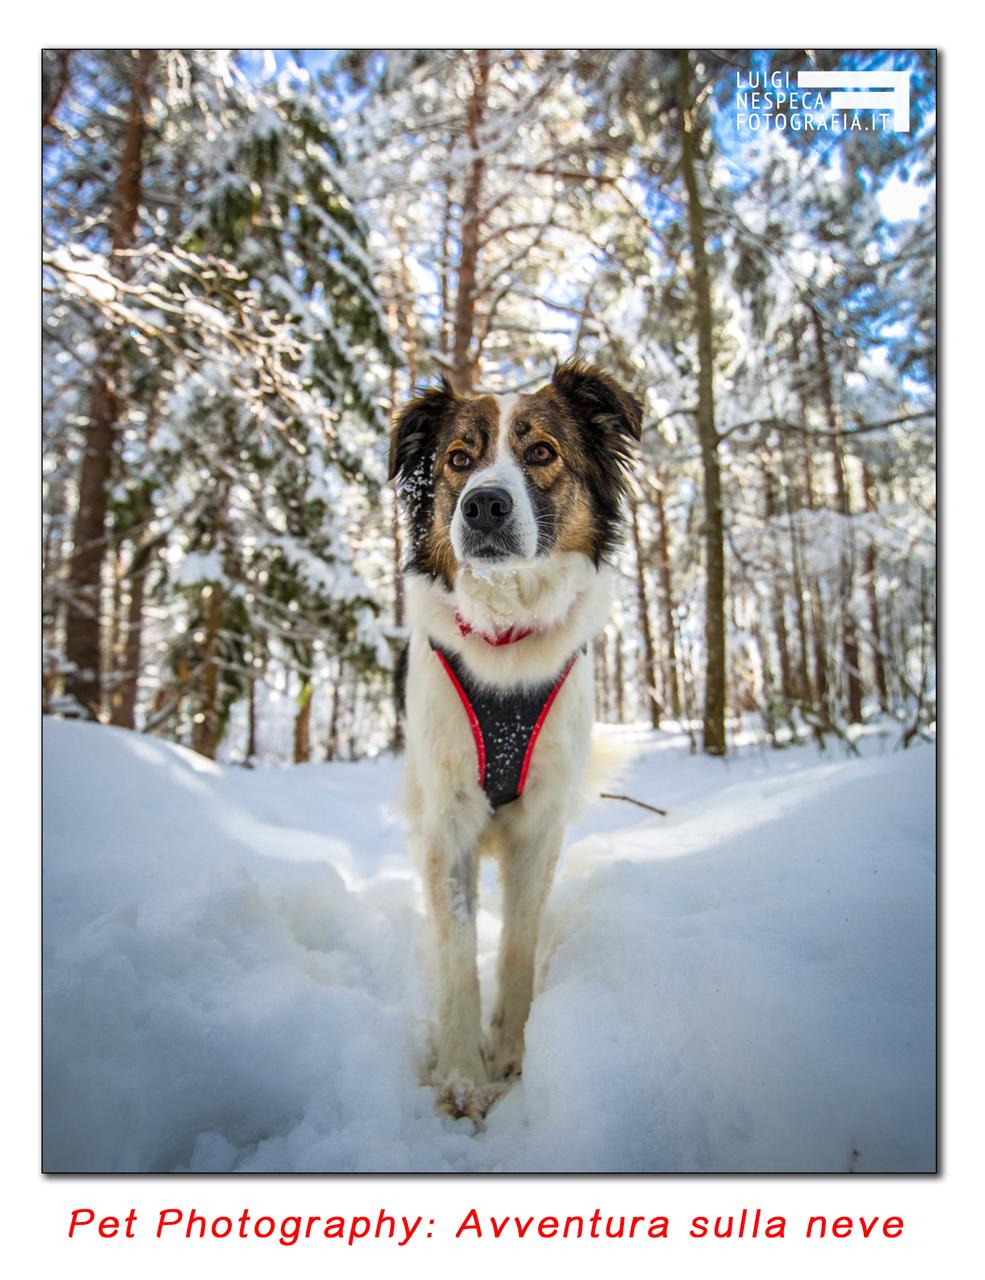 Pet Photography: reportage avventura sulla neve